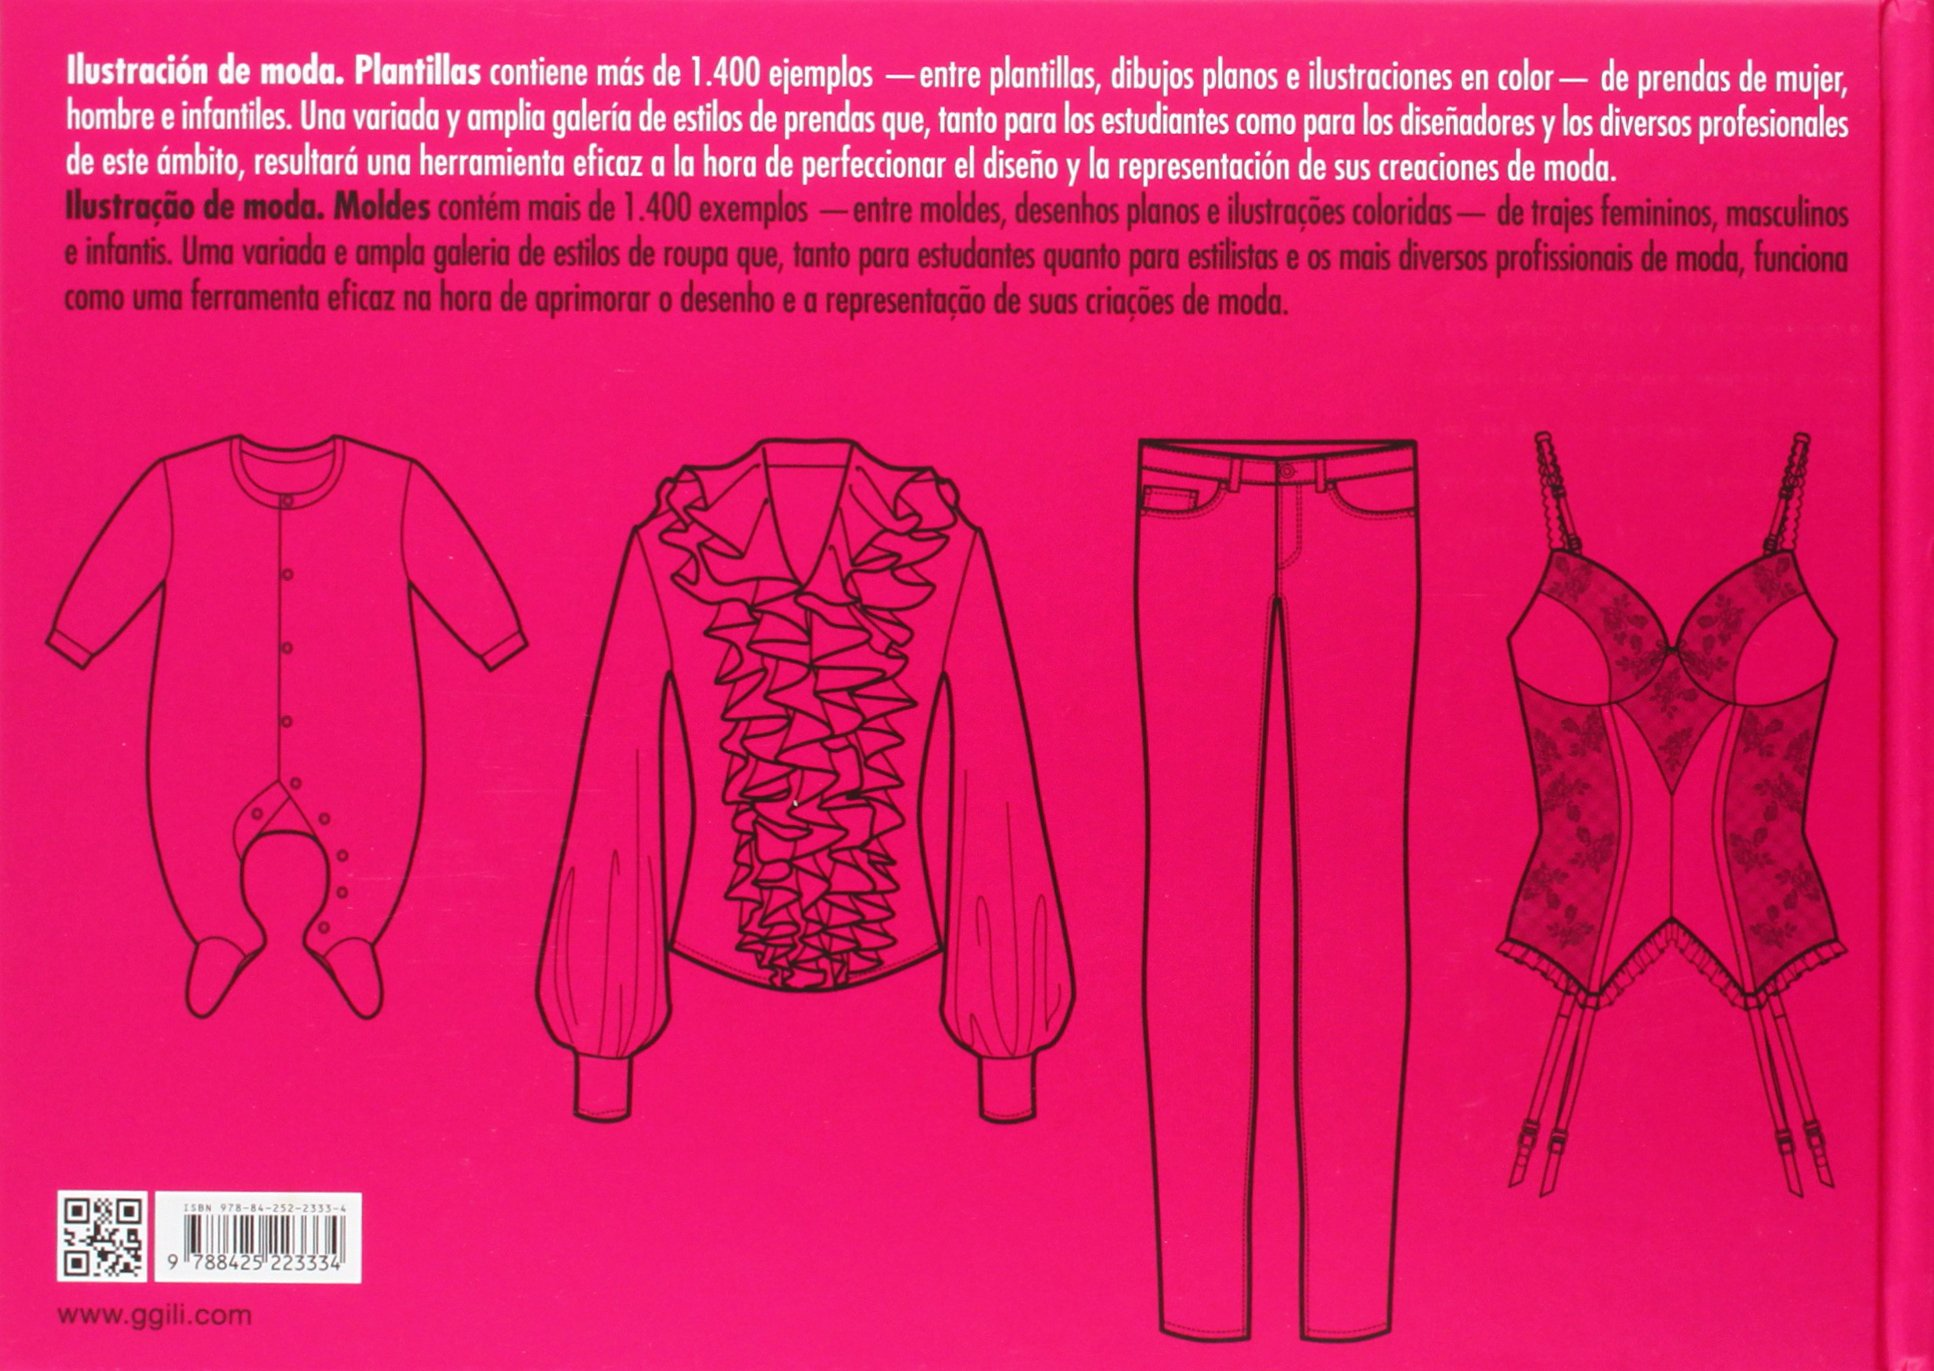 Ilustraçao de moda: Plantillas. Moldes (Spanish Edition): F. Volker Feyerabend, Belén Herrero, Iara Biderman, Frauke Gosh: 9788425223334: Amazon.com: Books